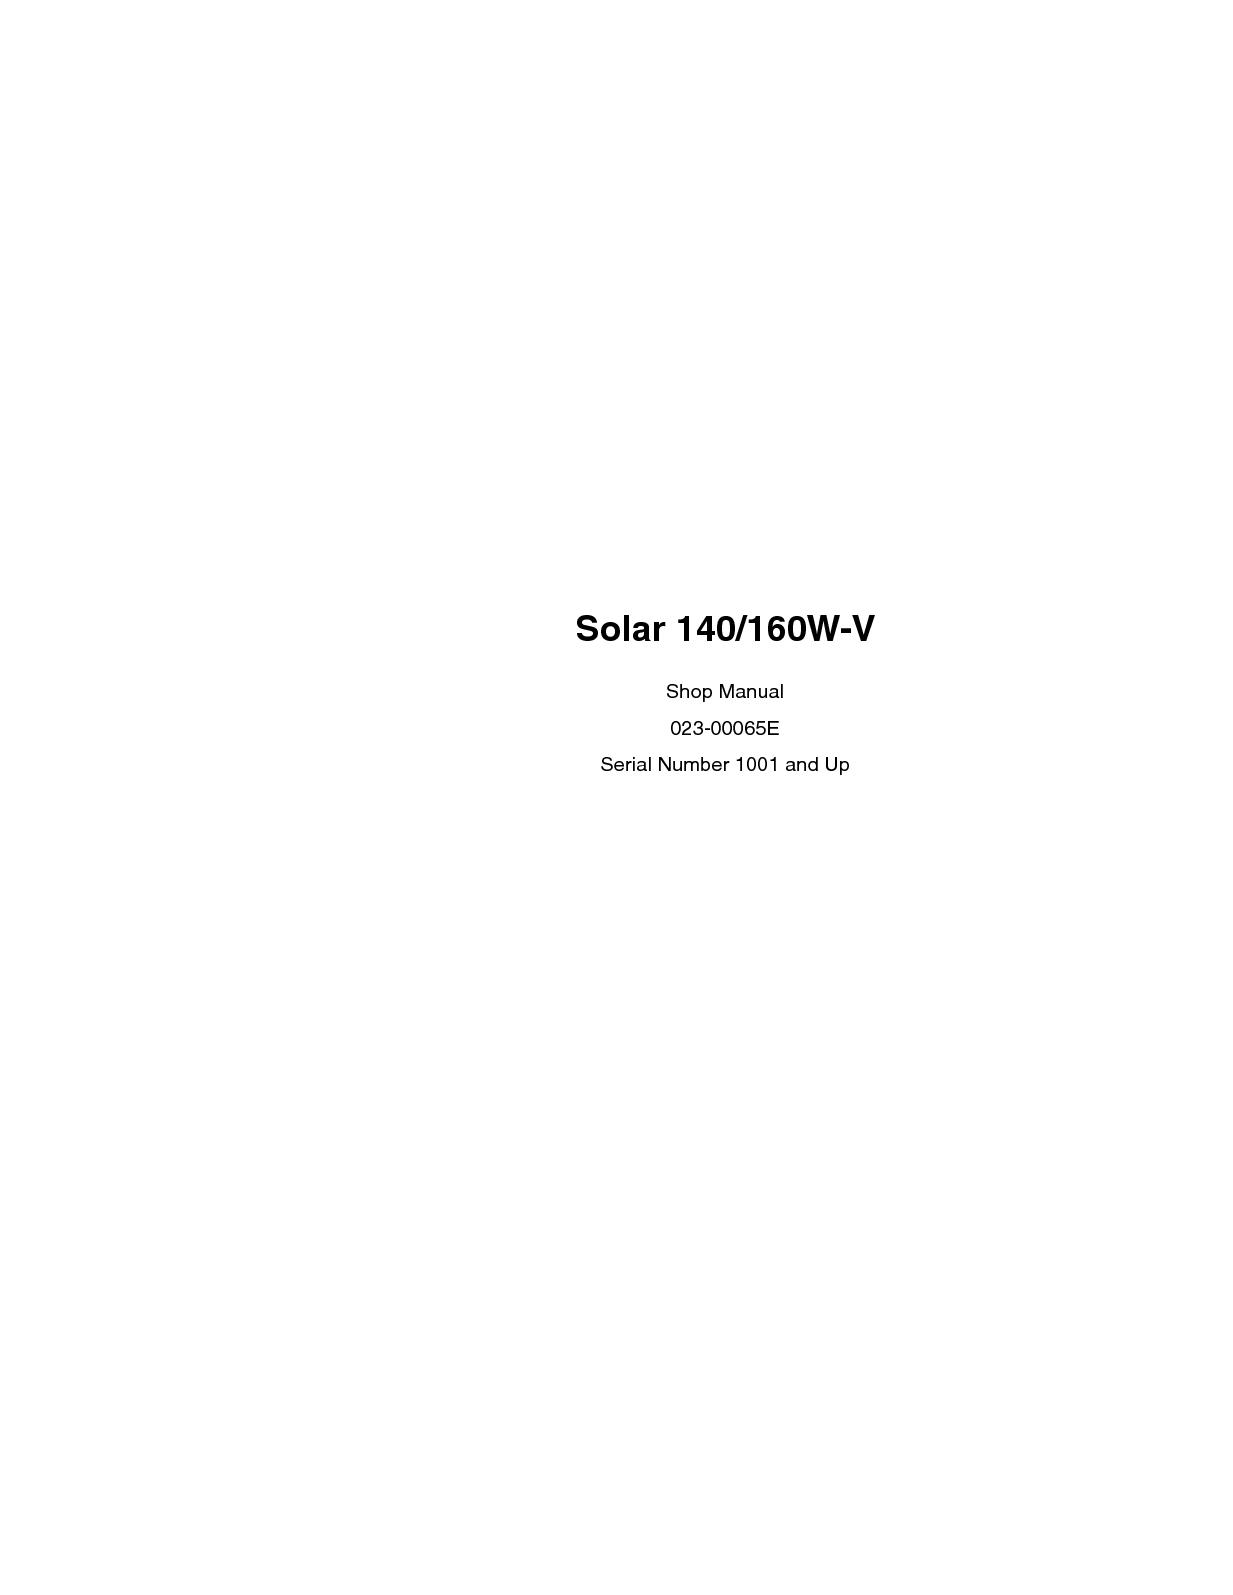 Calaméo - Daewoo Doosan Solar 140W V Wheel Excavator Service Repair Manual